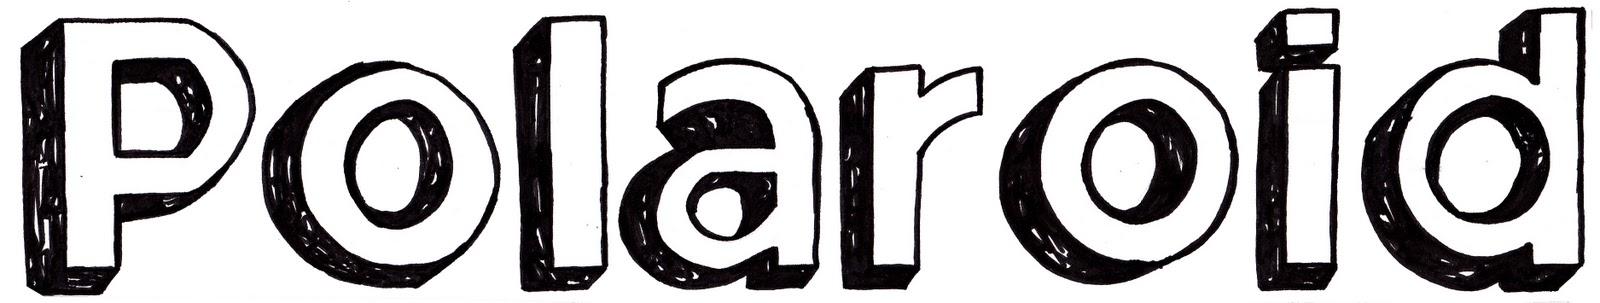 ... logo design with the same font used on the original polaroid logo